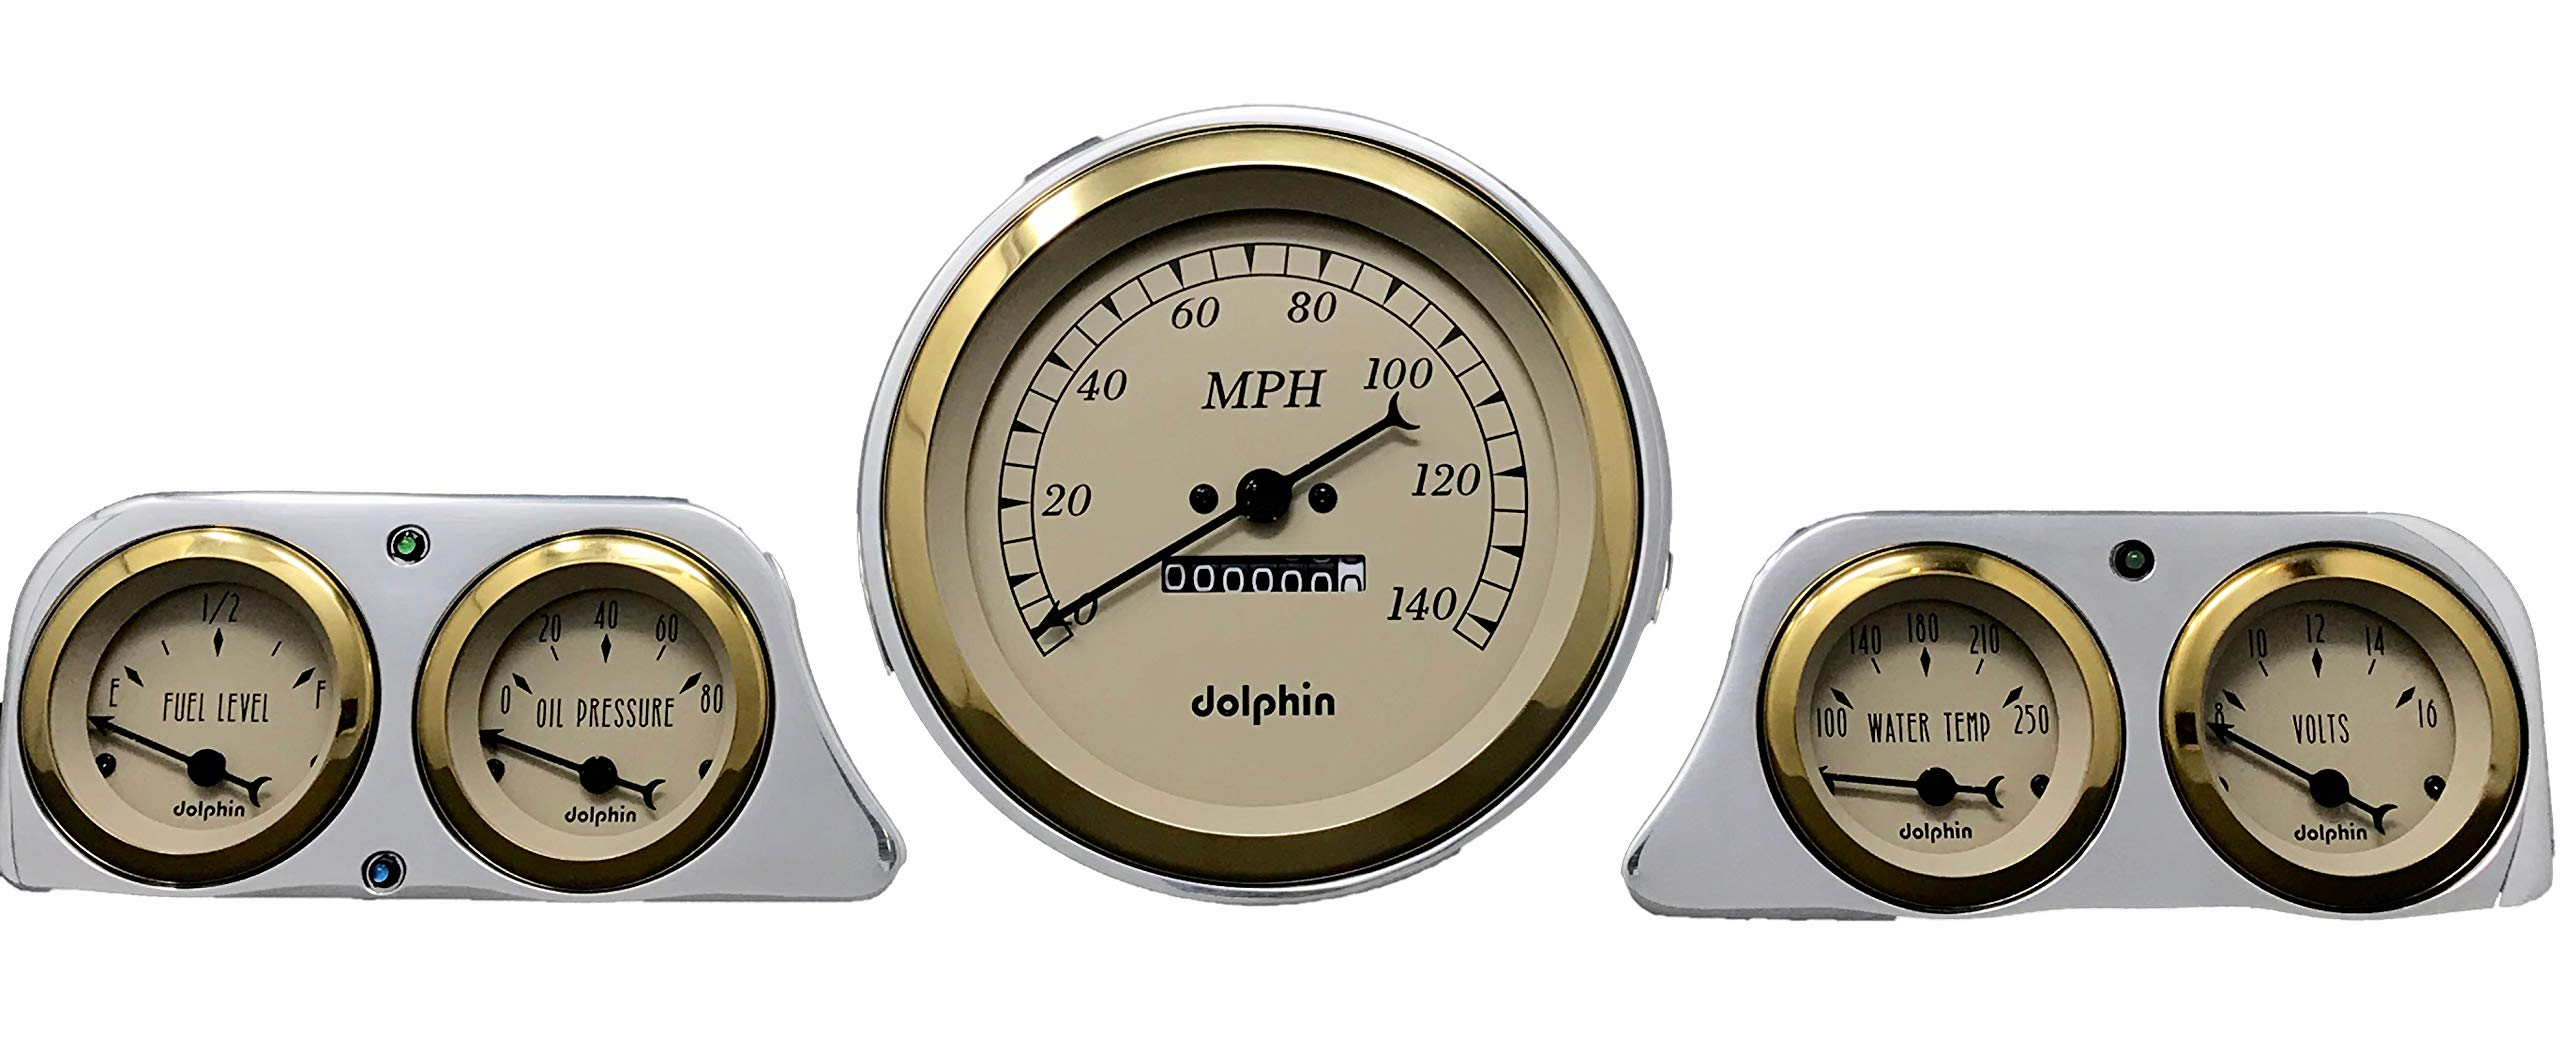 Dolphin Gauges 1949 Mercury Car 5 Gauge Dash Cluster Panel 5'' Speedo Mechanical Gold by Dolphin Gauges